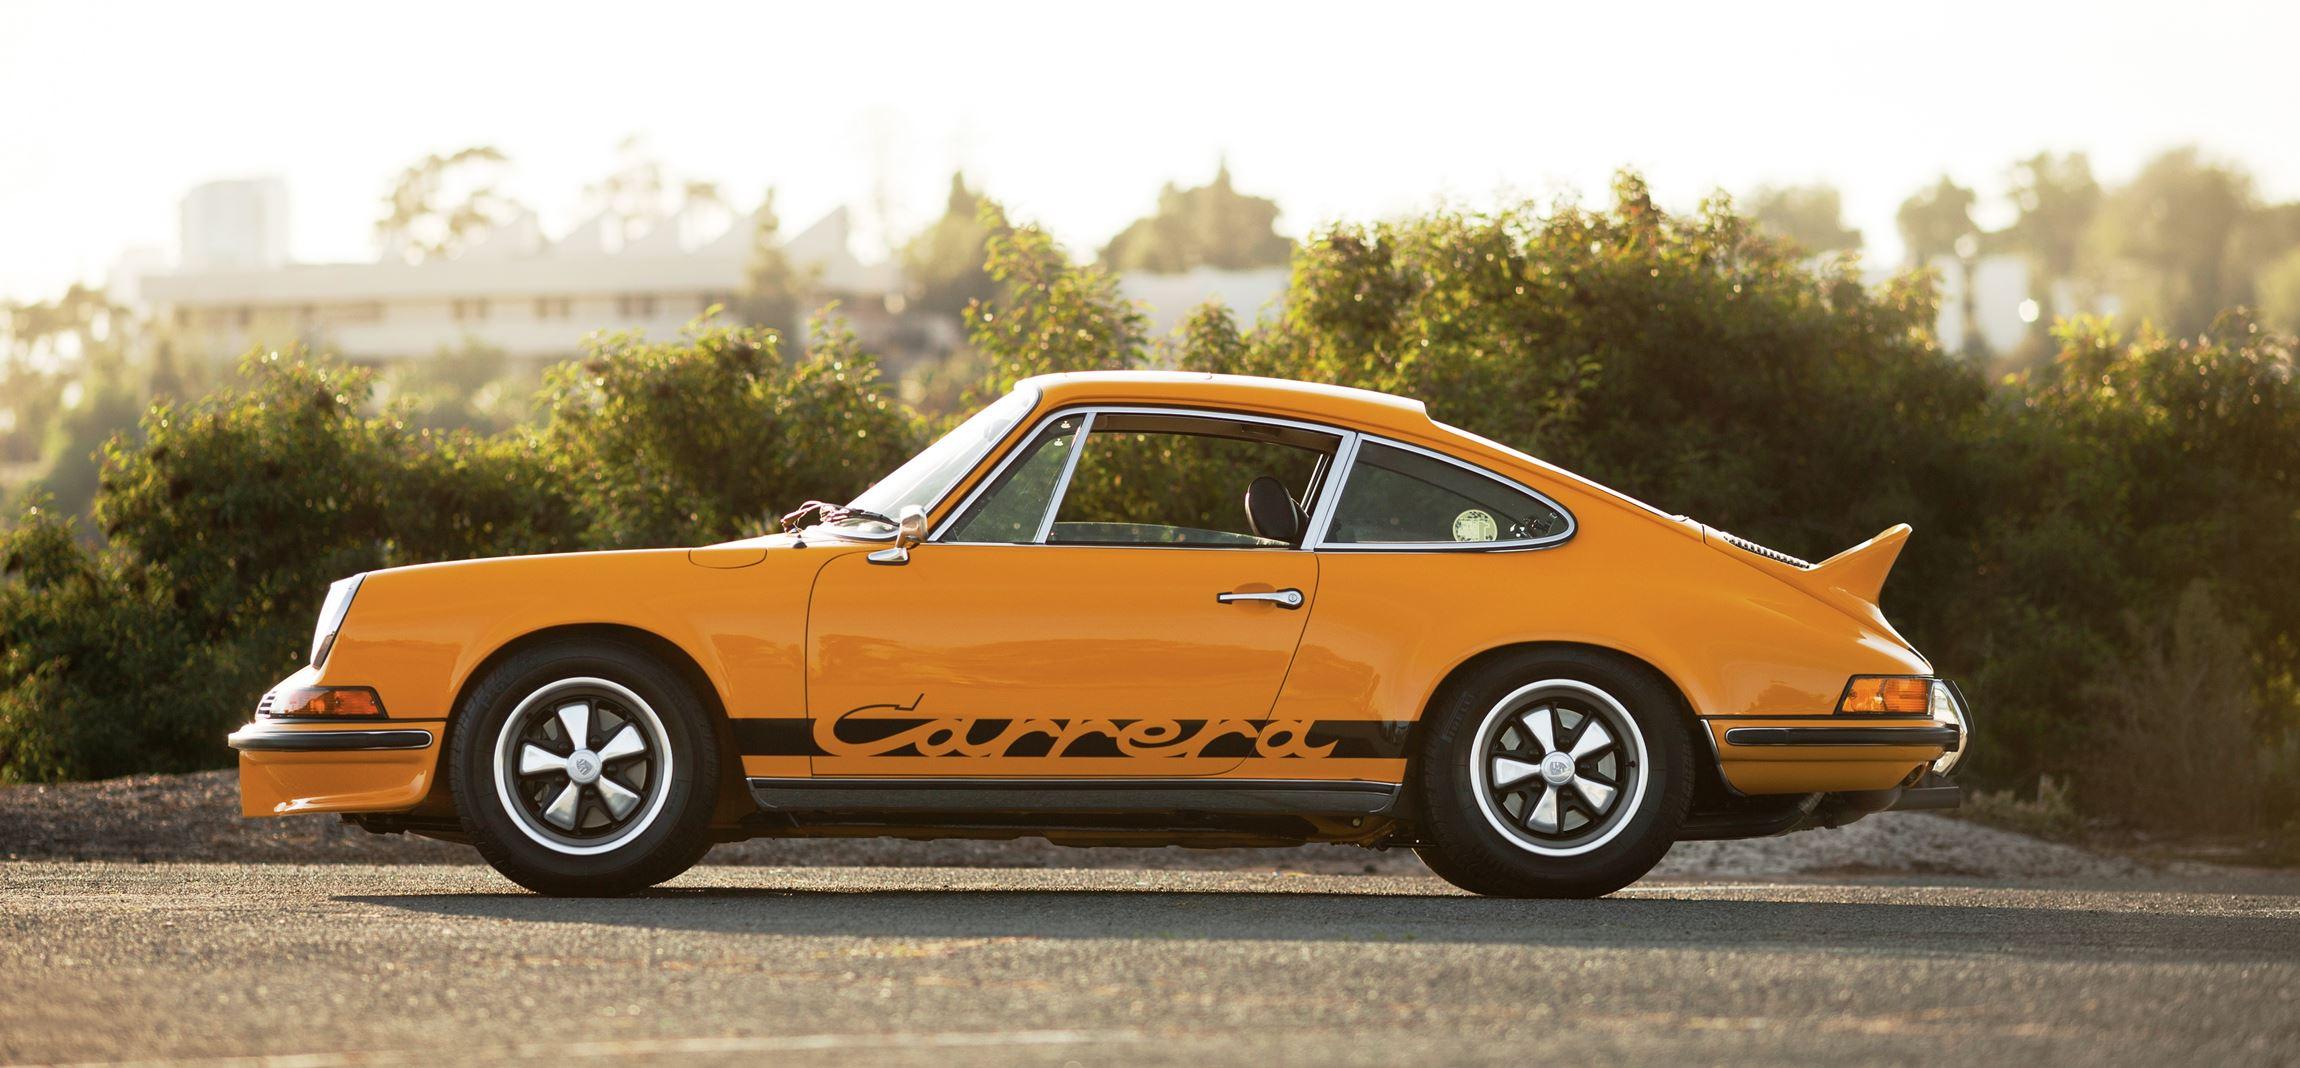 1973 Porsche 911 Carrera Rs 2 7 Touring 16